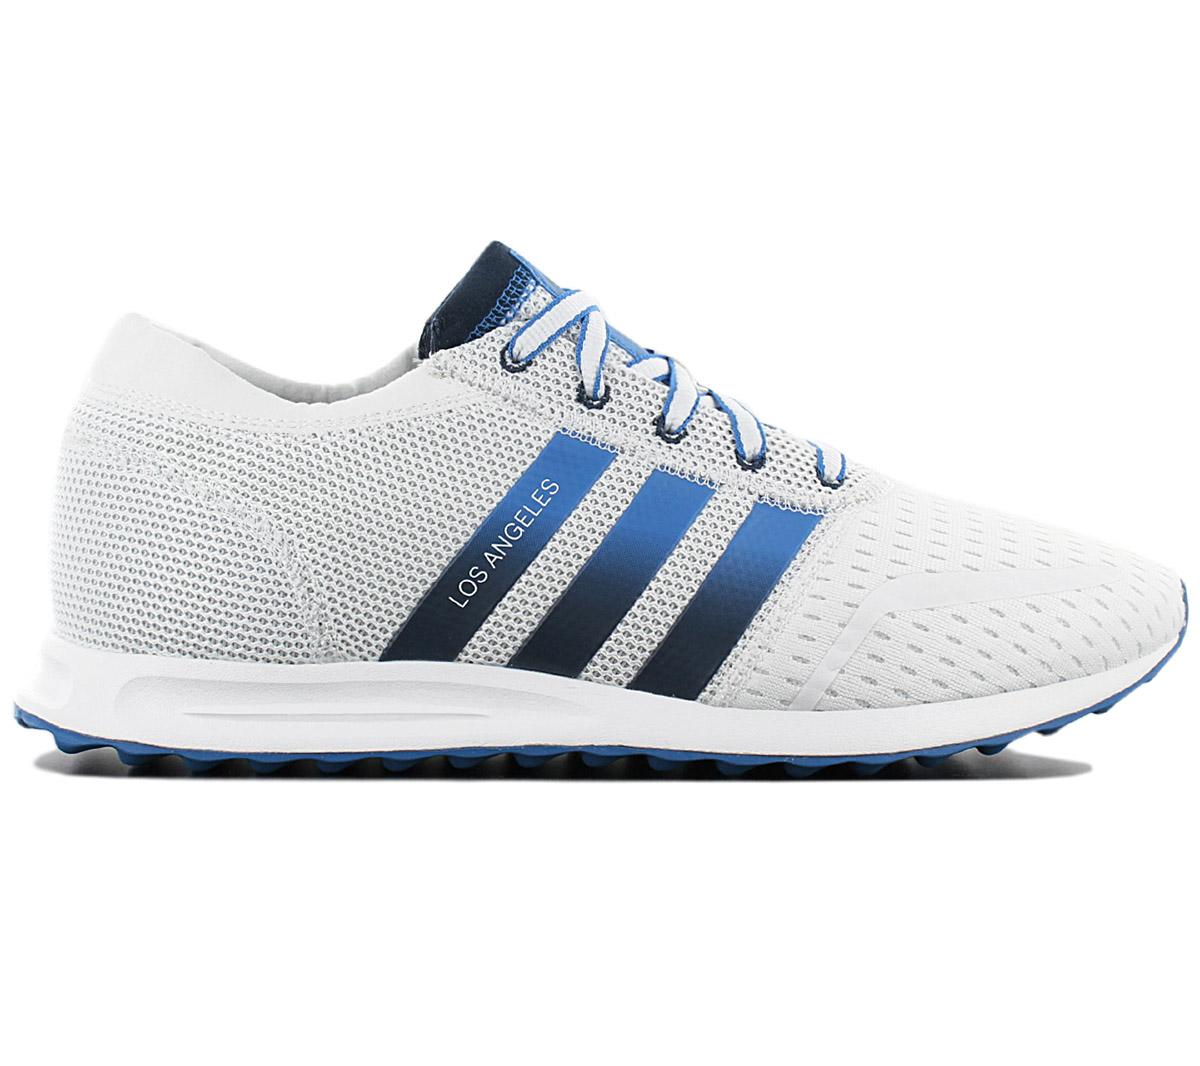 Adidas Los Angeles Grau AD Originals Schuhe Herren